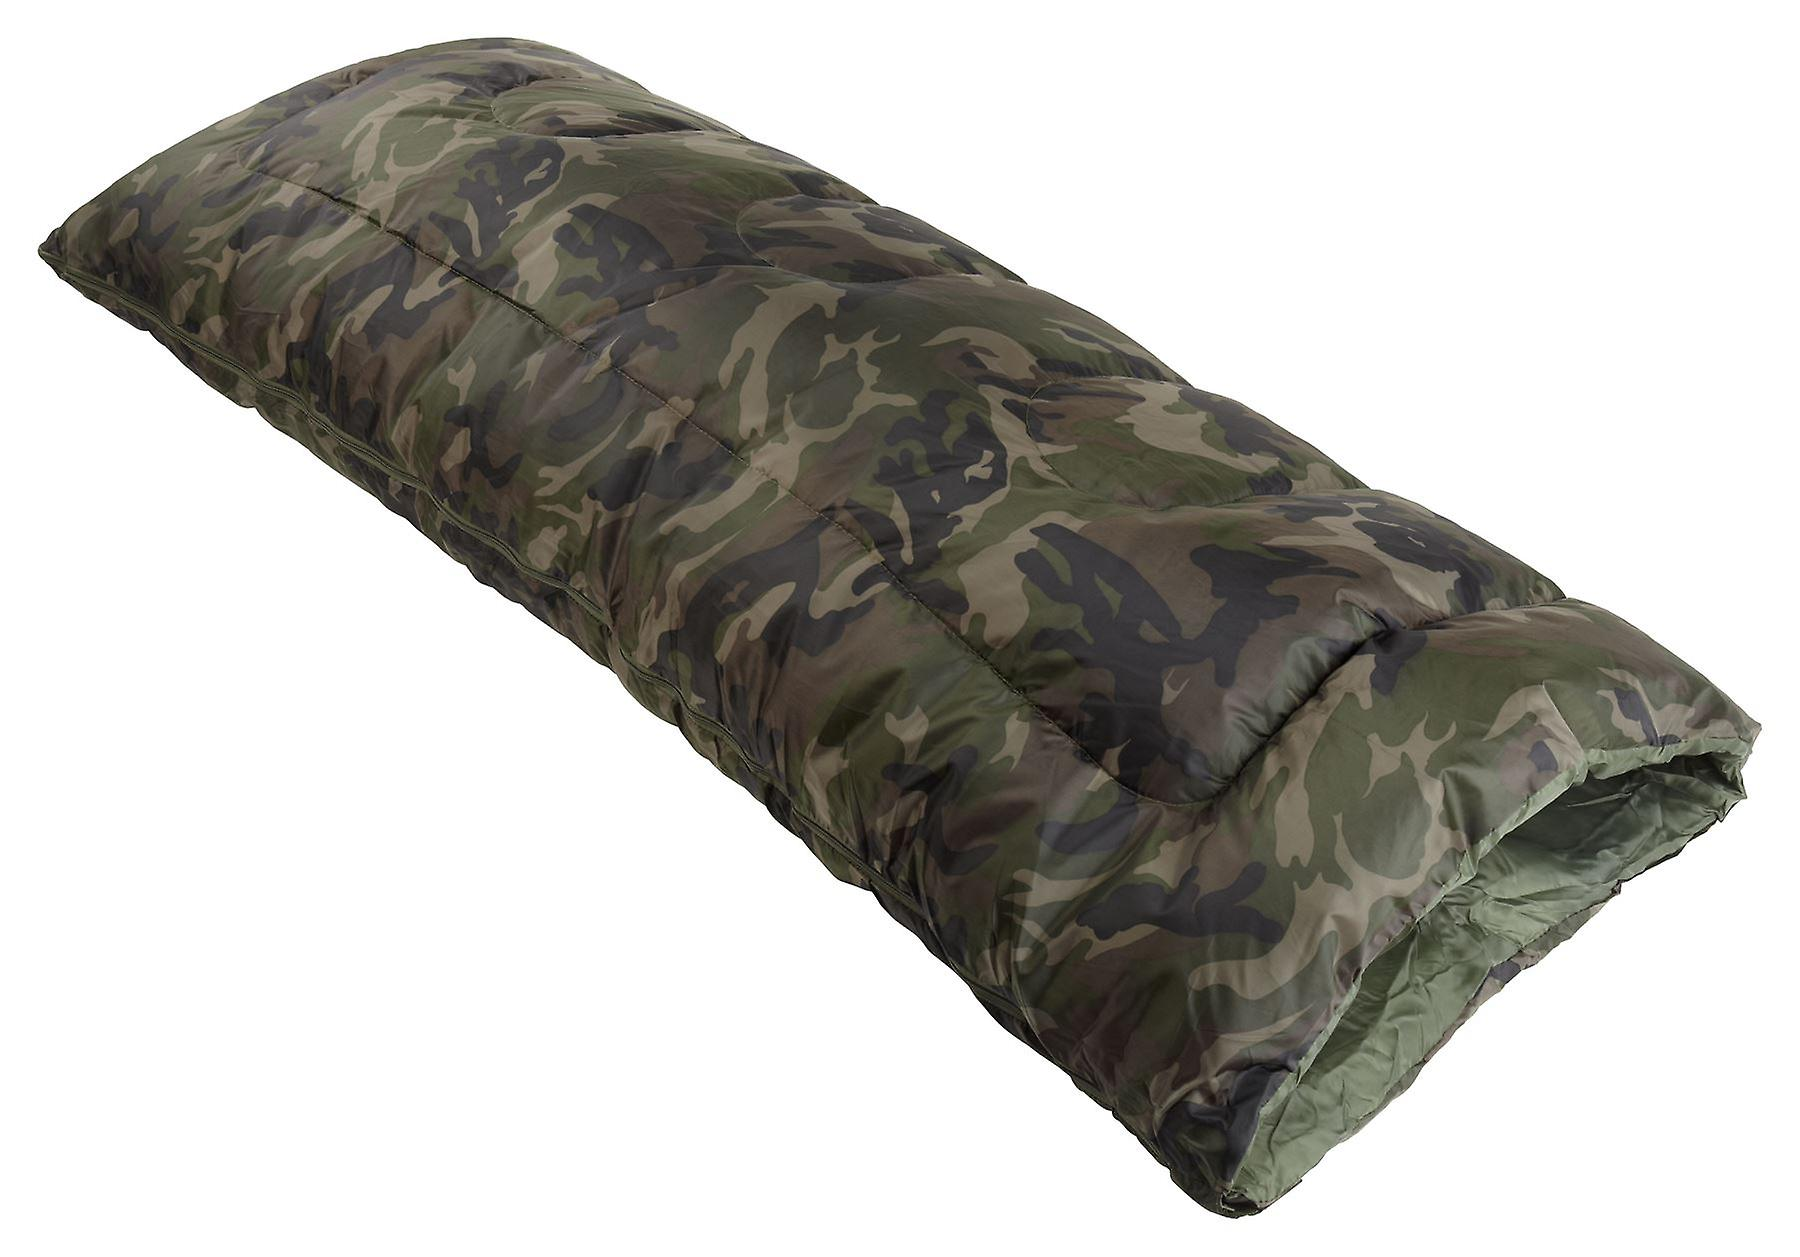 Brand New Single Envelope Style Sleeping Bag